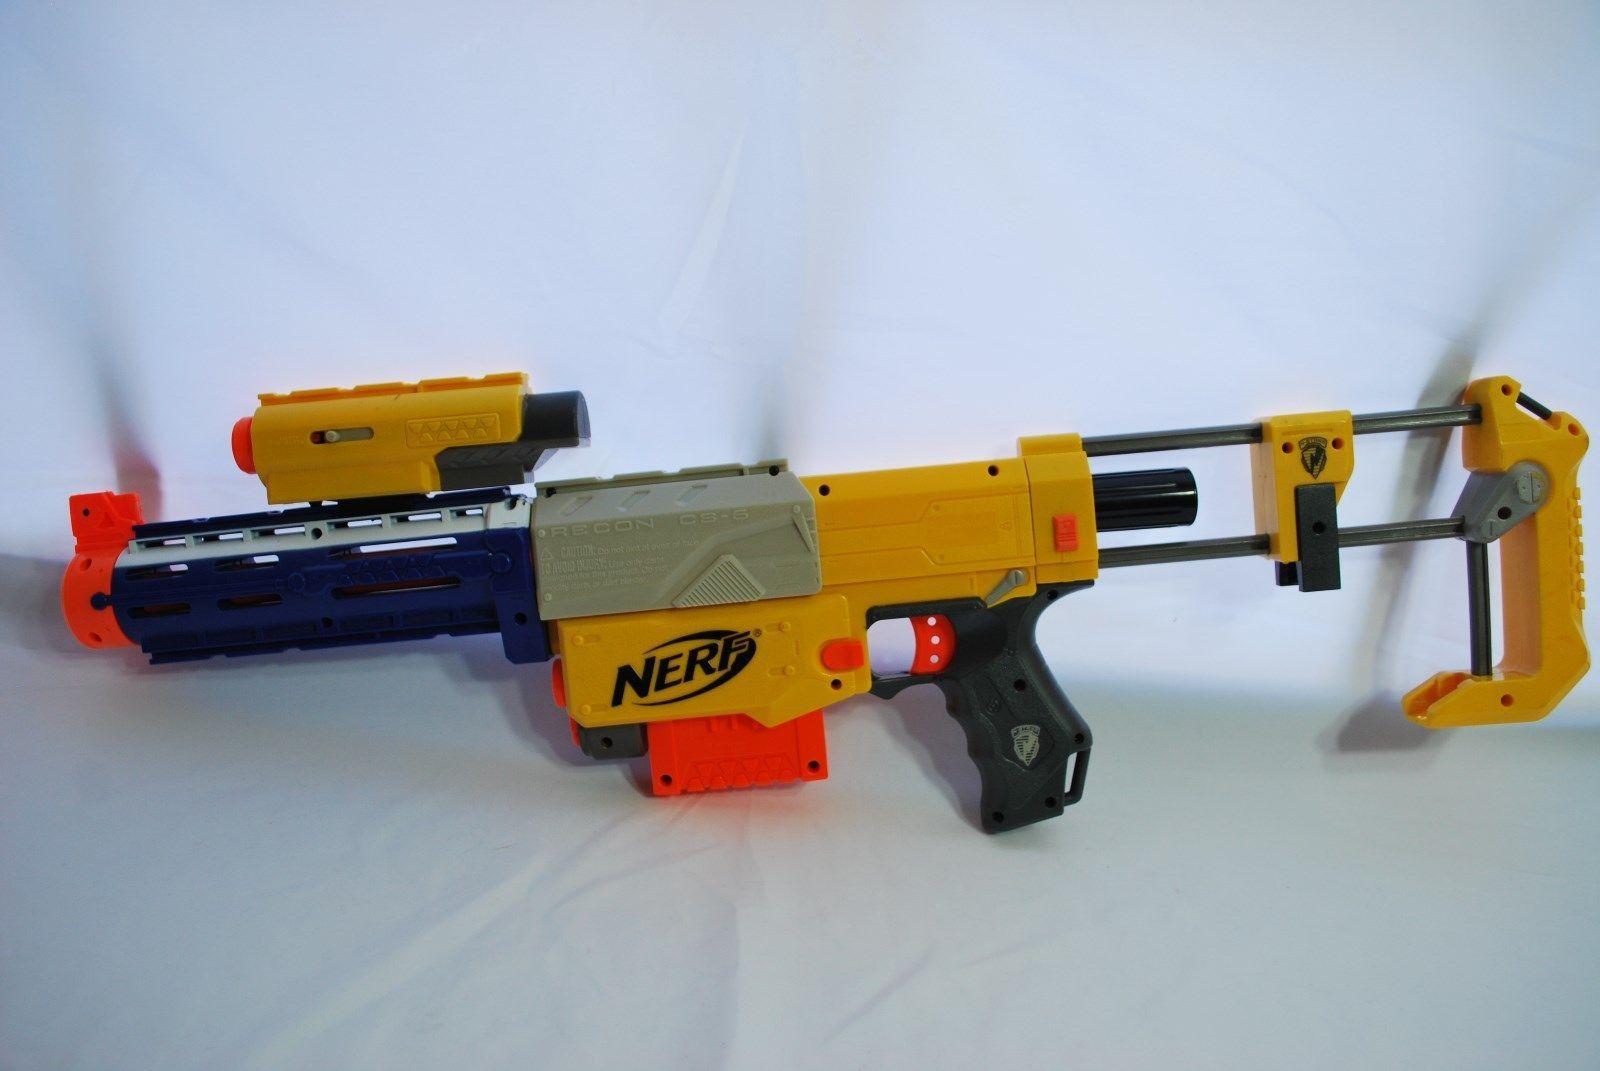 Amazon.com: Nerf Gun Rifle - Nerf Zombie Strike SlingFire Blaster Rifle Gun  with 25 Dart Drum and 31 Darts Exclusive Limited Edition with Nerf Zombie  Strike ...